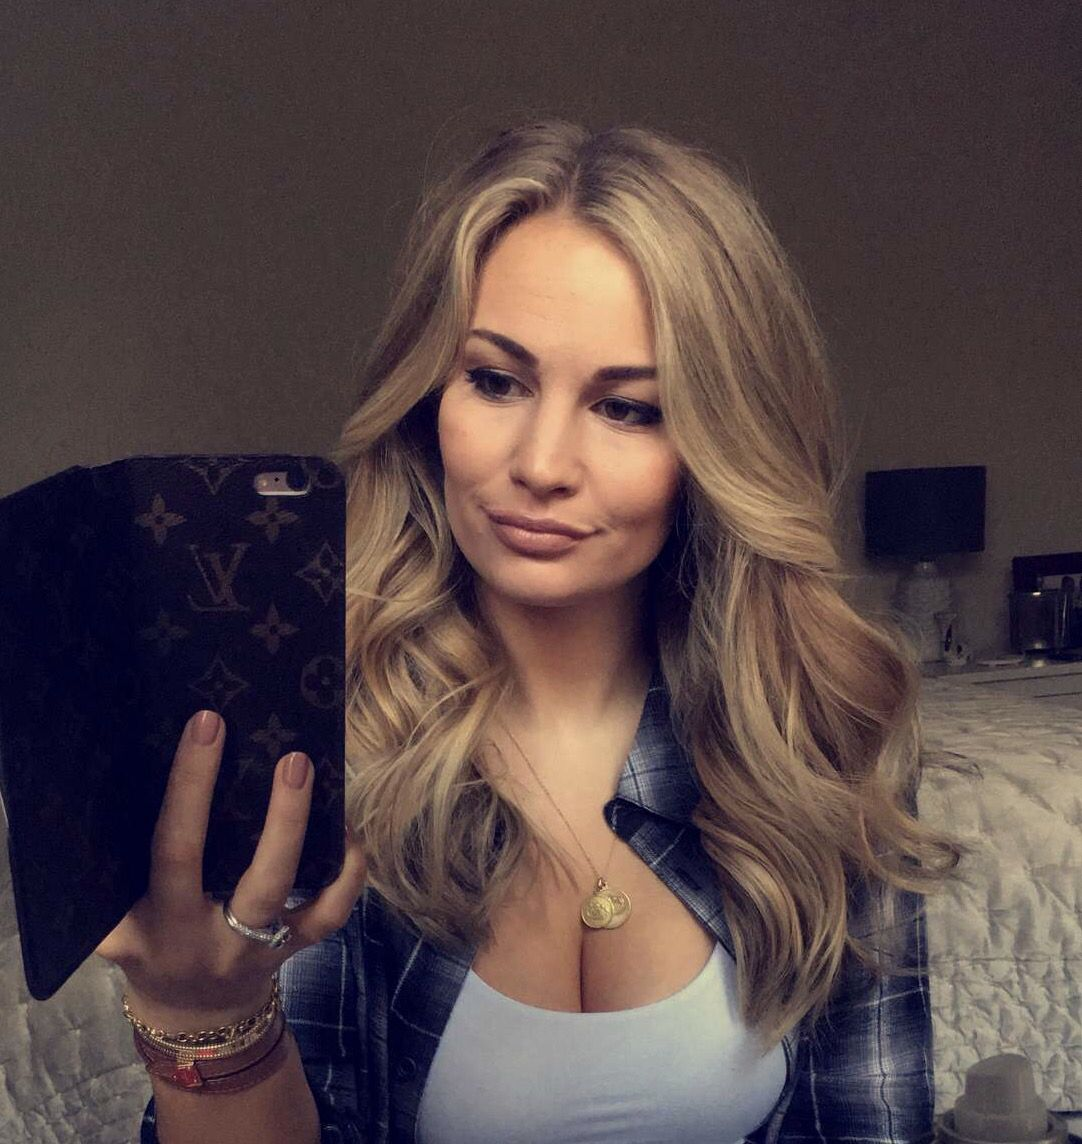 Anna Saccone-Joly Net Worth 2018 - The Gazette Review